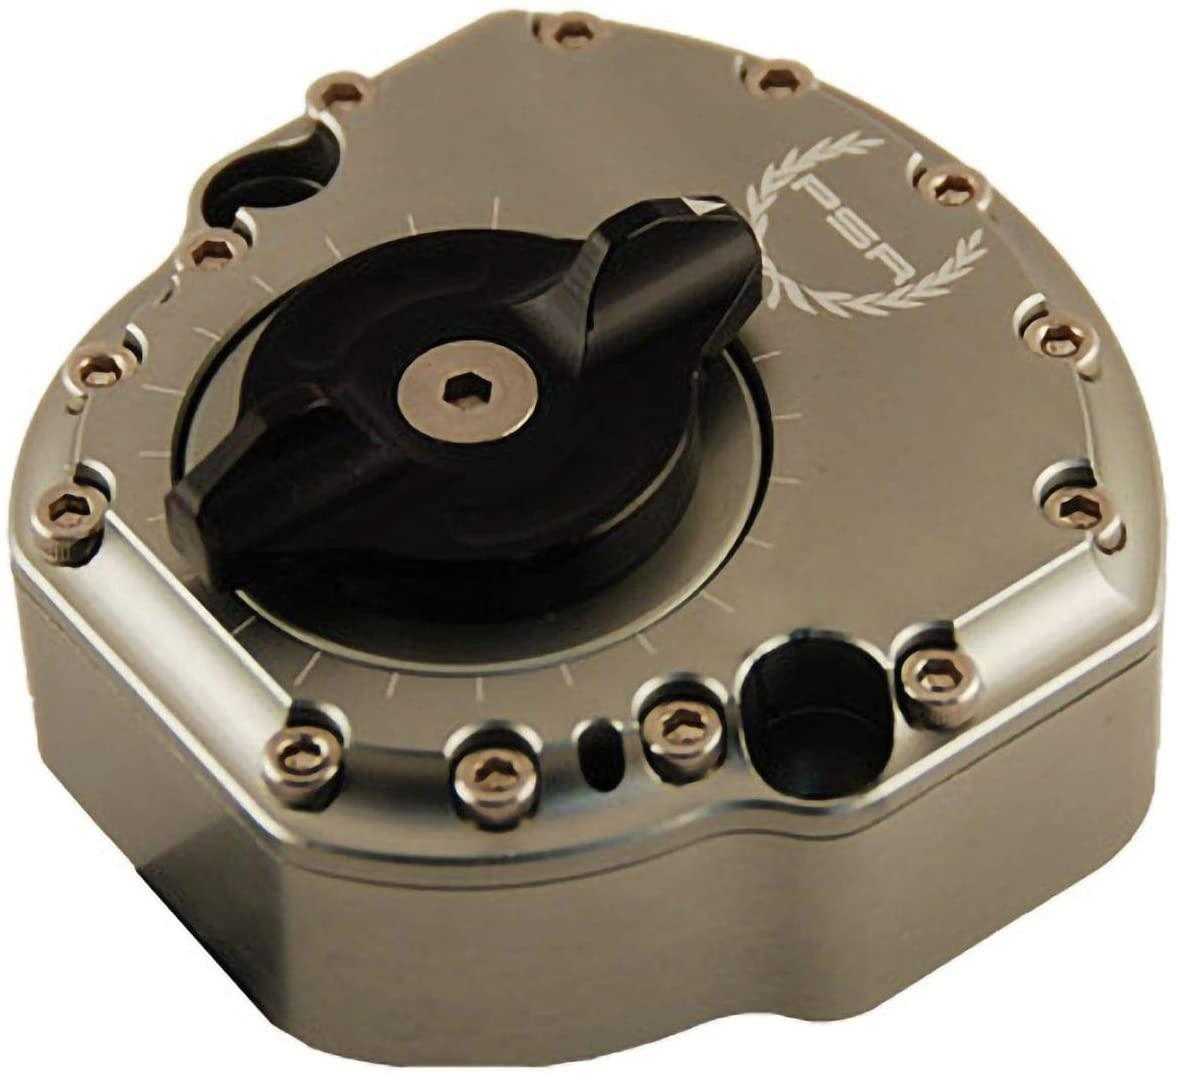 PSR Steering Damper (Gunmetal) for 18-20 Yamaha MT-07